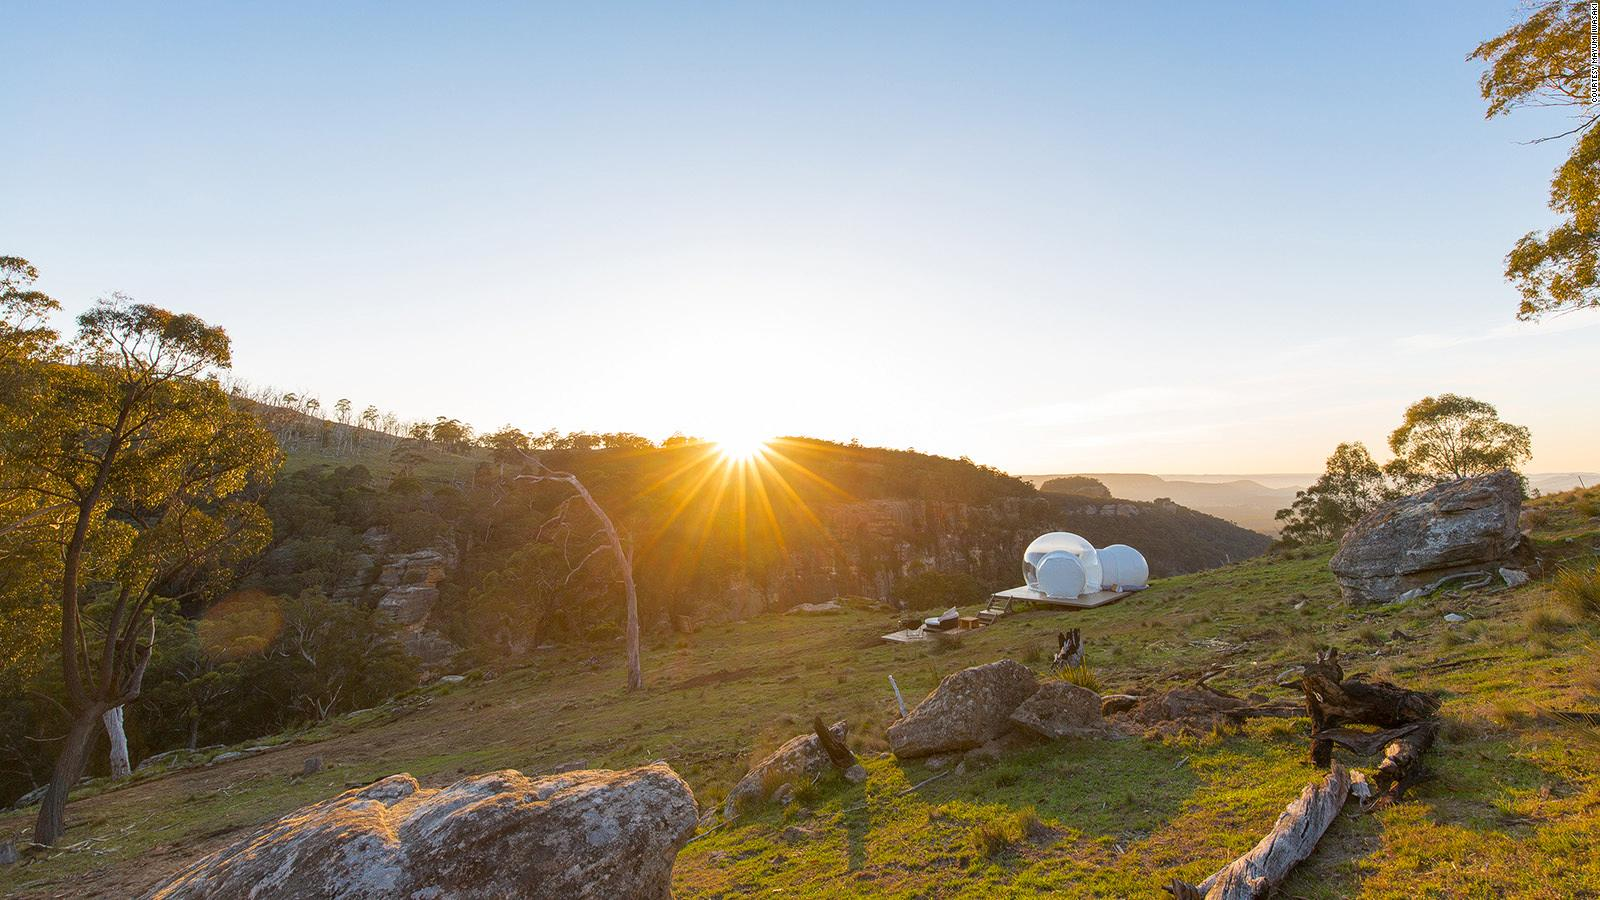 Wonderful Bubbletent Australia, The Ultimate Skygazing Experience | CNN Travel